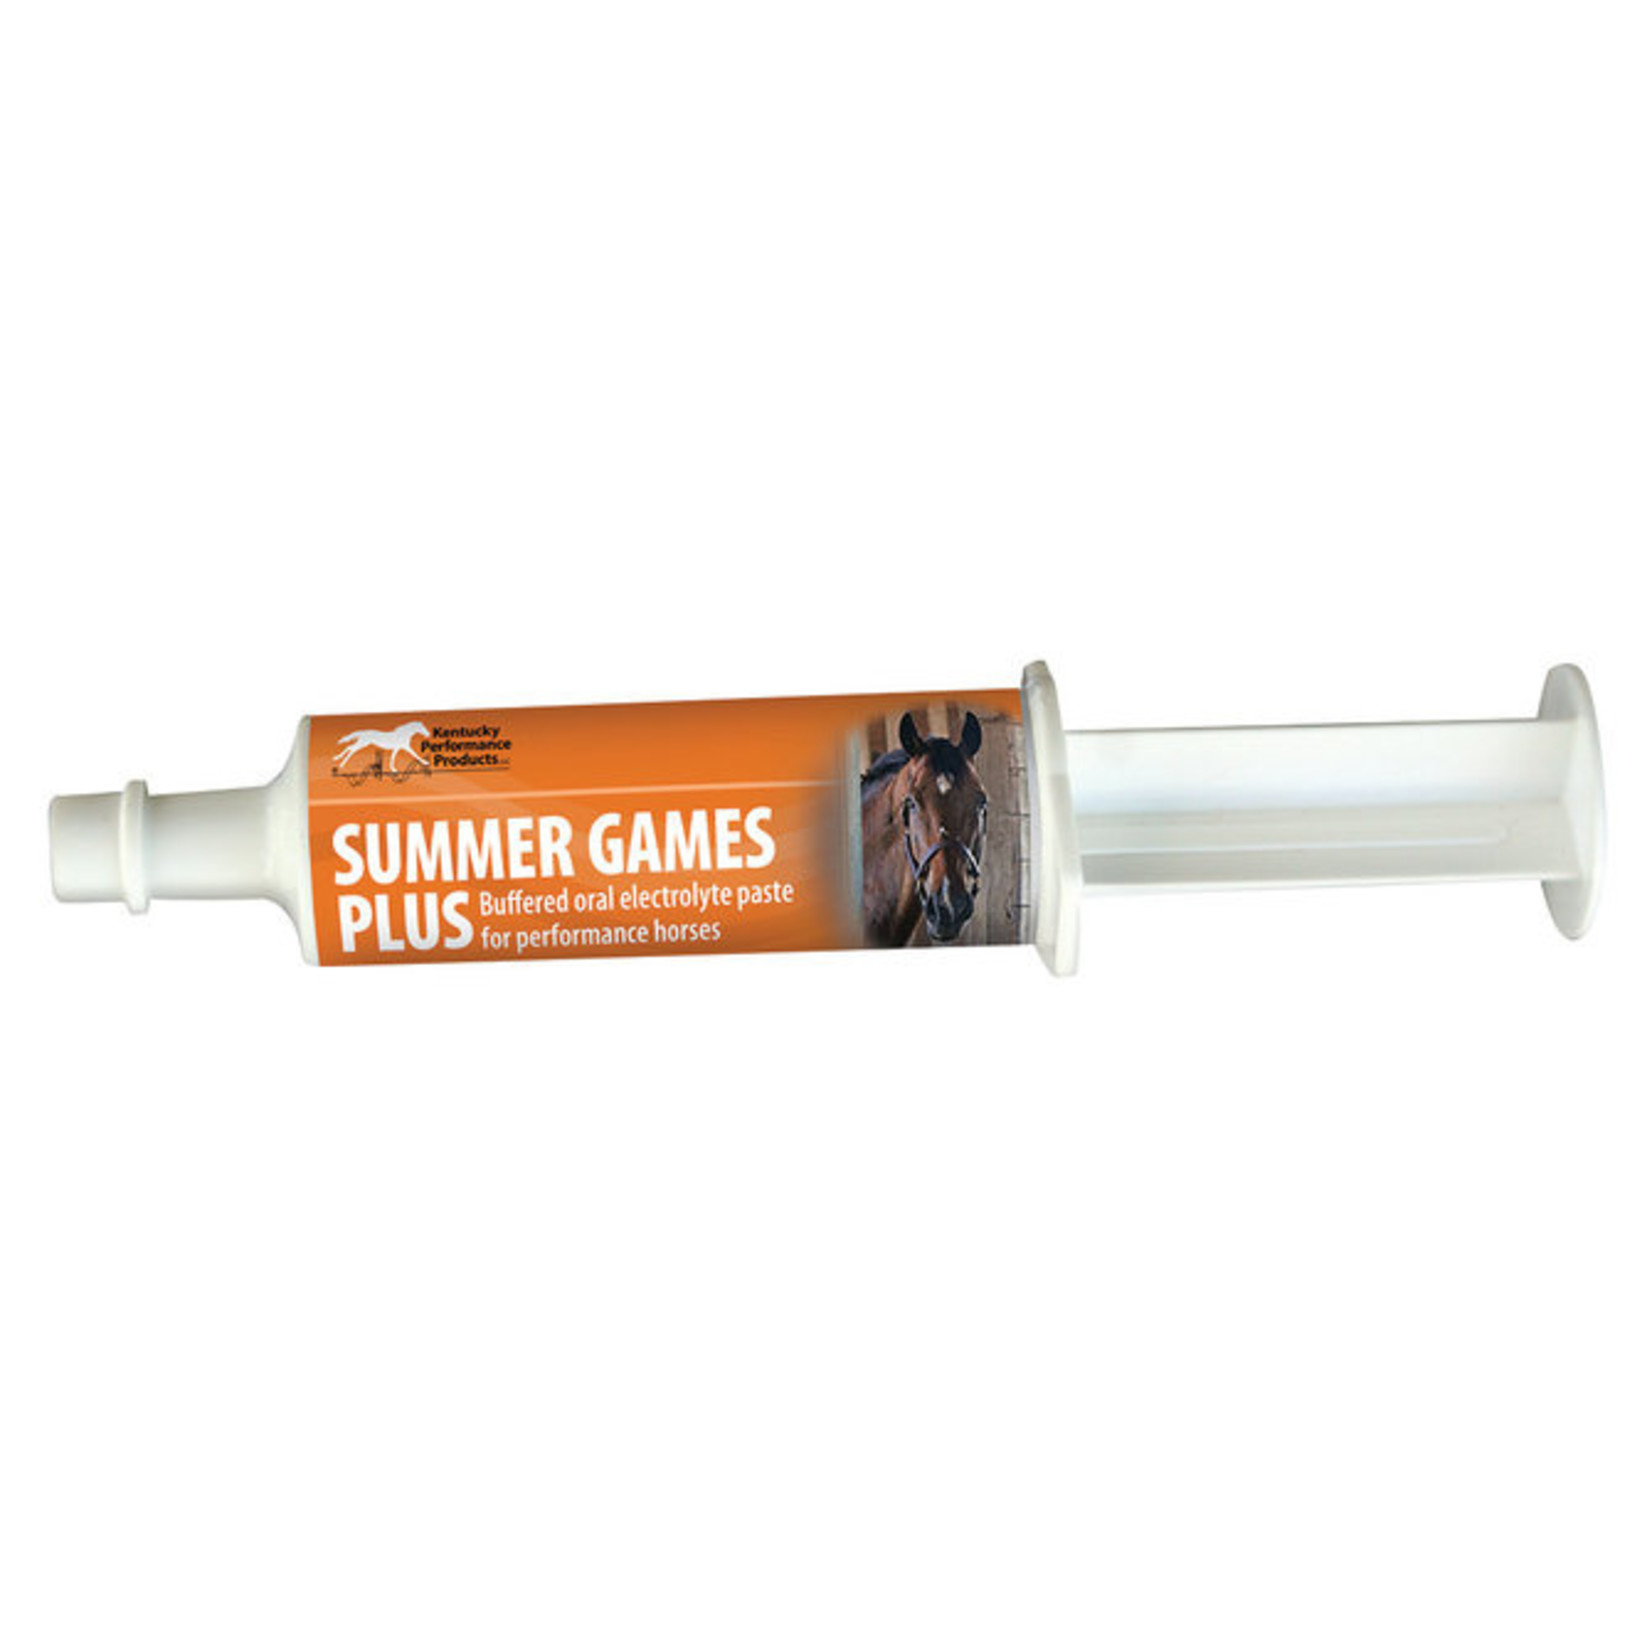 Summer Games Electrolyte